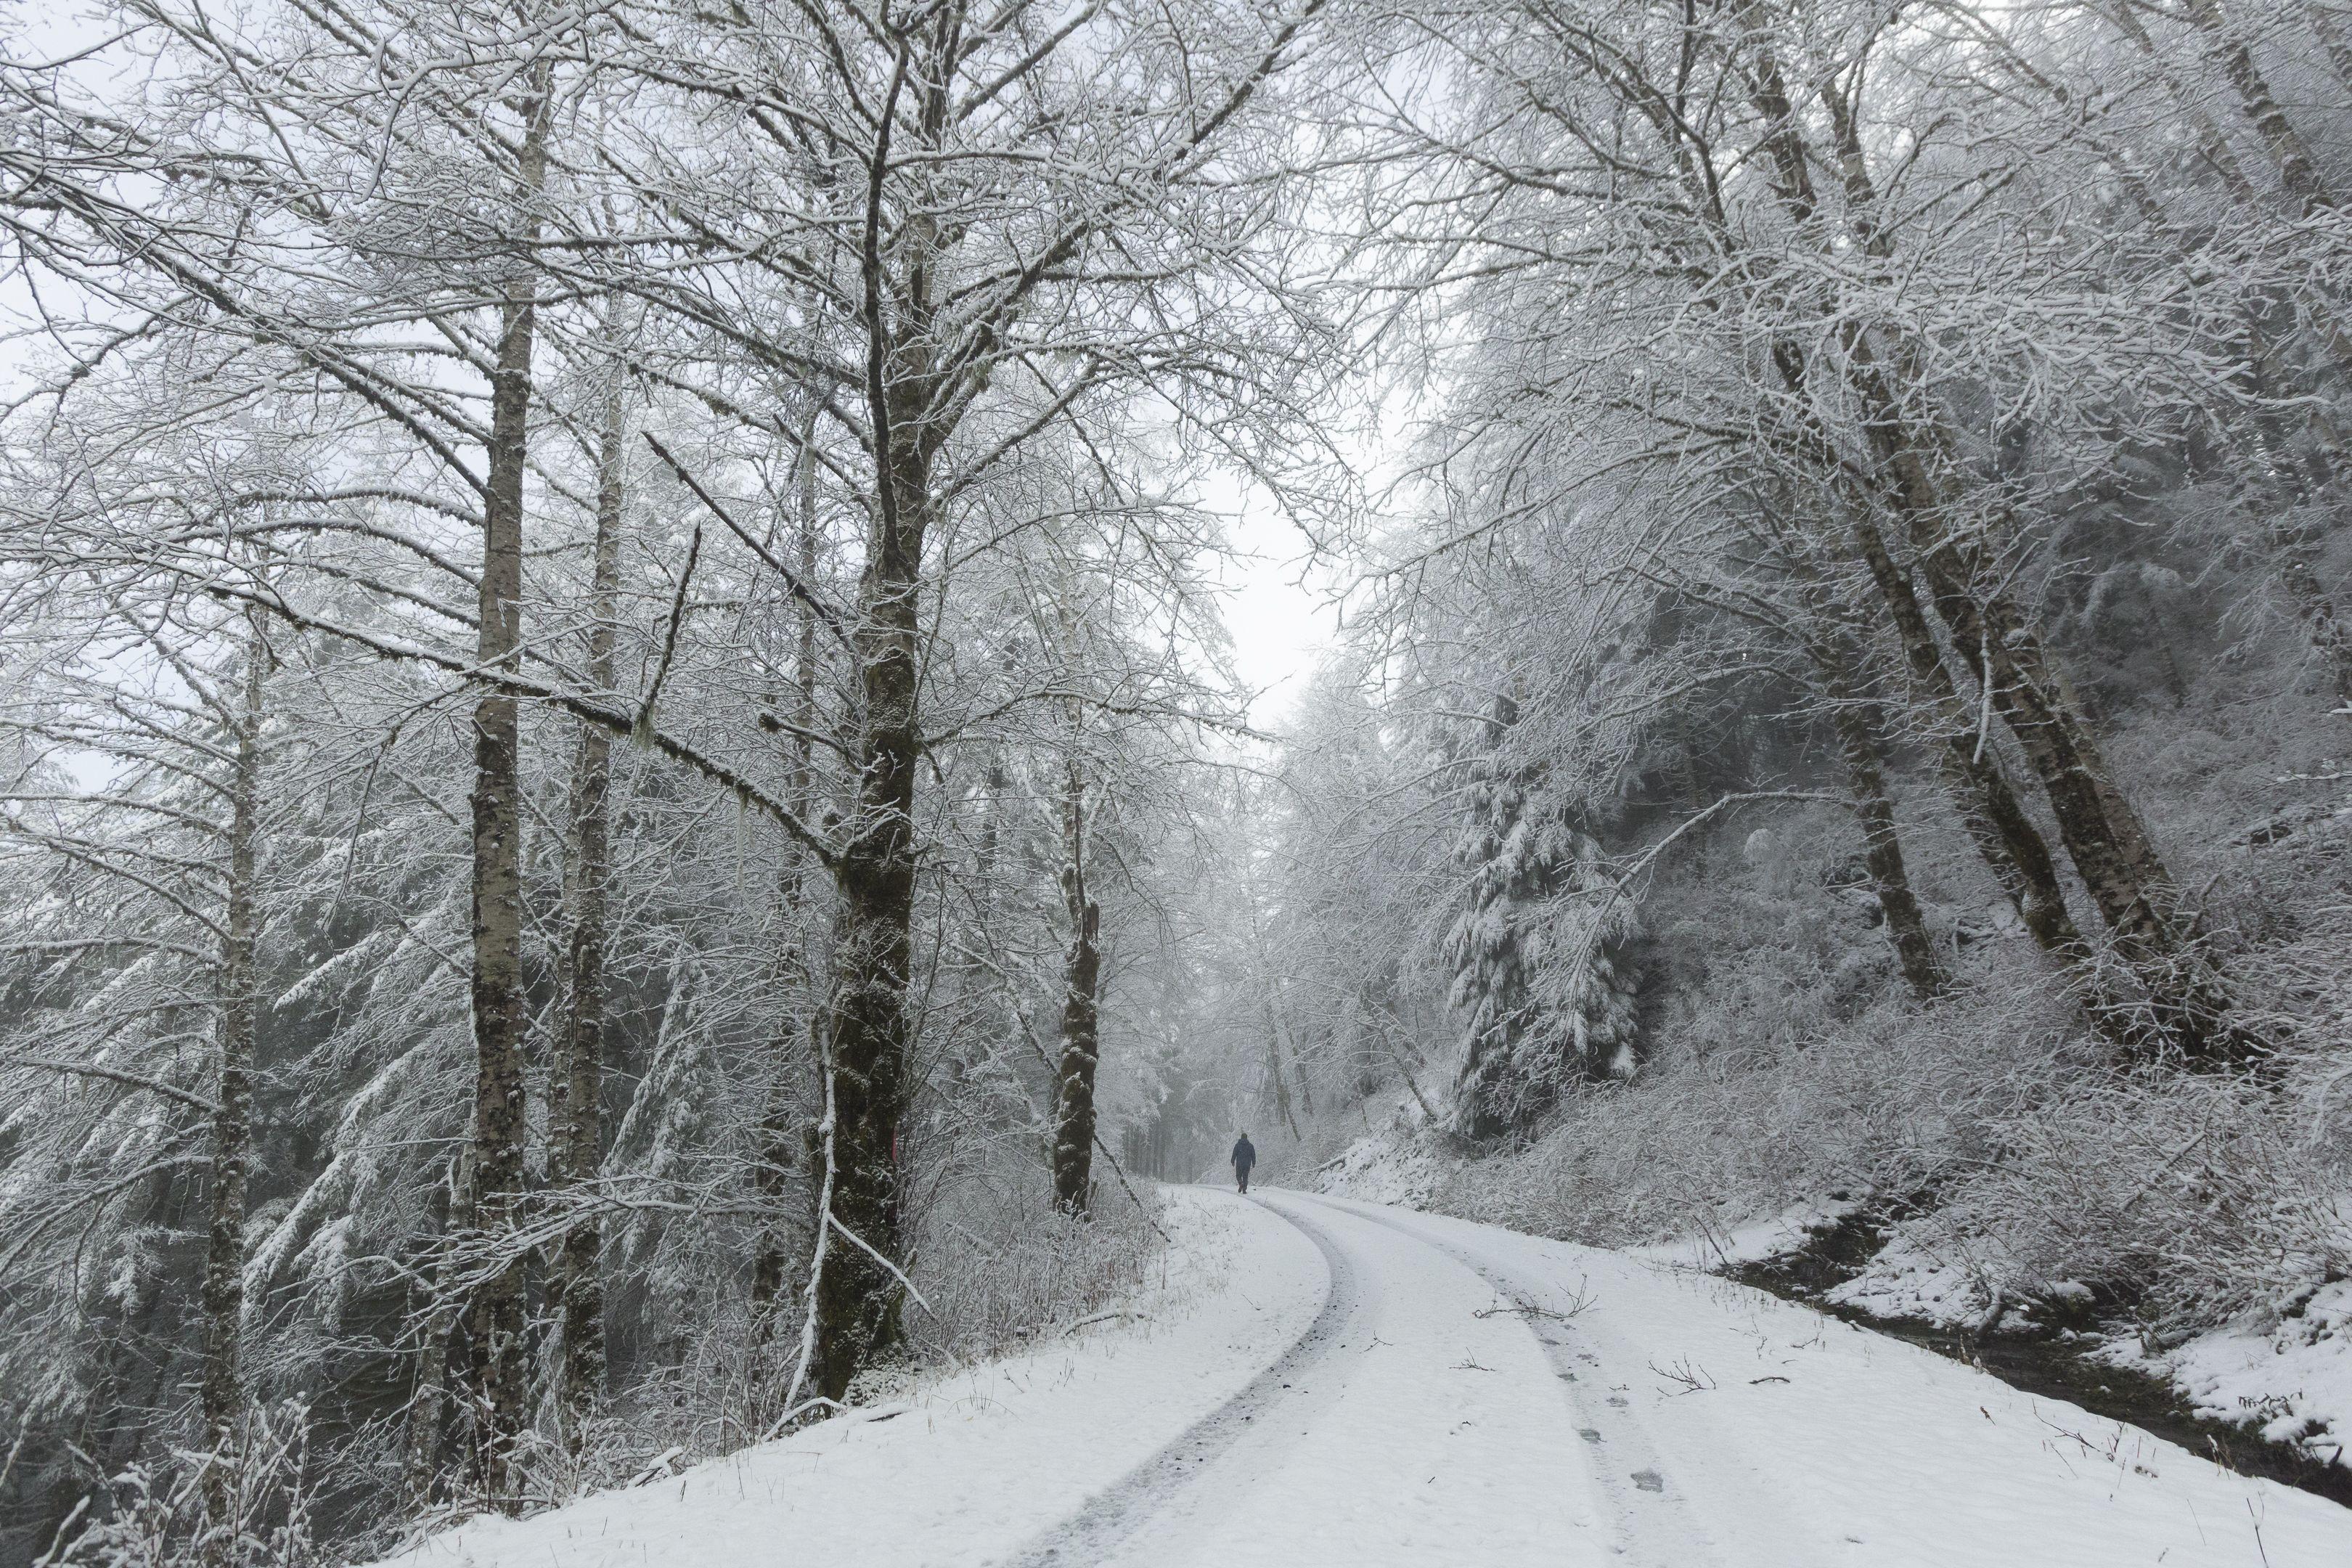 One Of Those Snowy Days On The Tillamook Coast